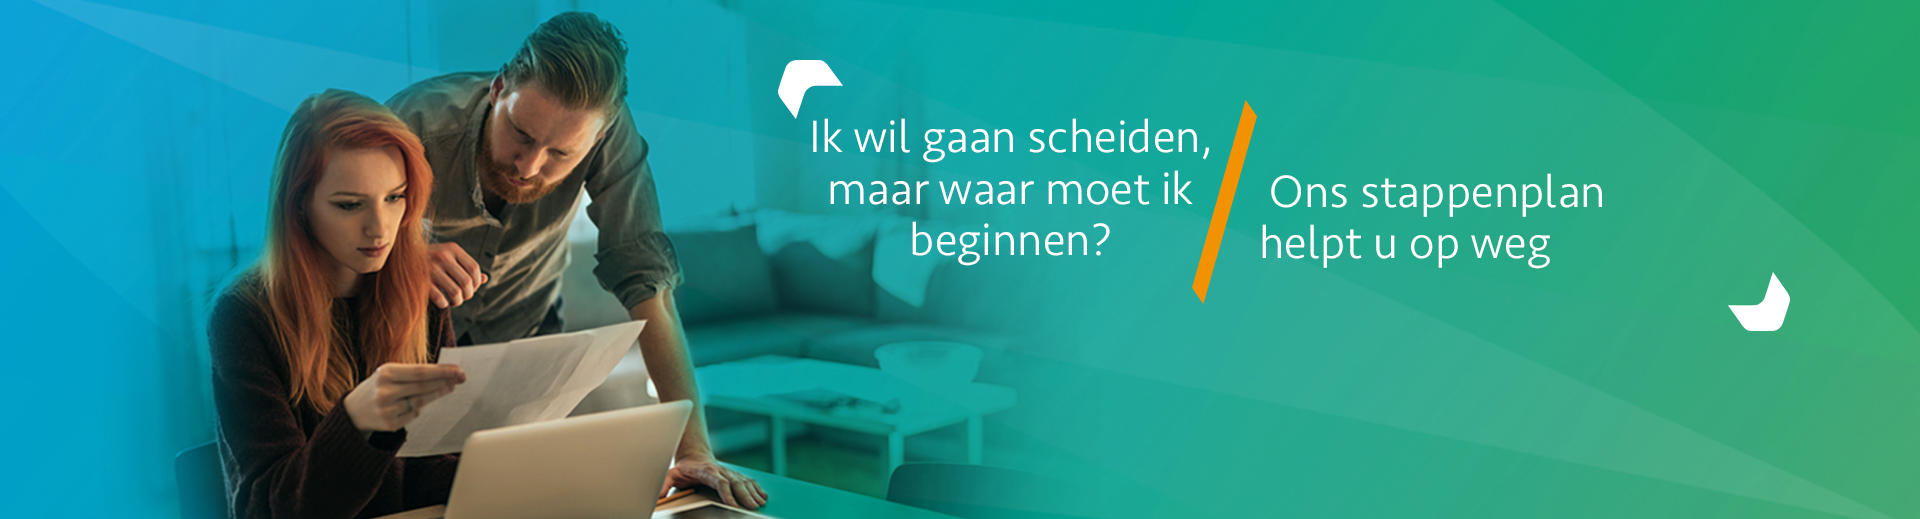 stappenplan scheiden - Scheidingsplanner Den Haag & Rijswijk